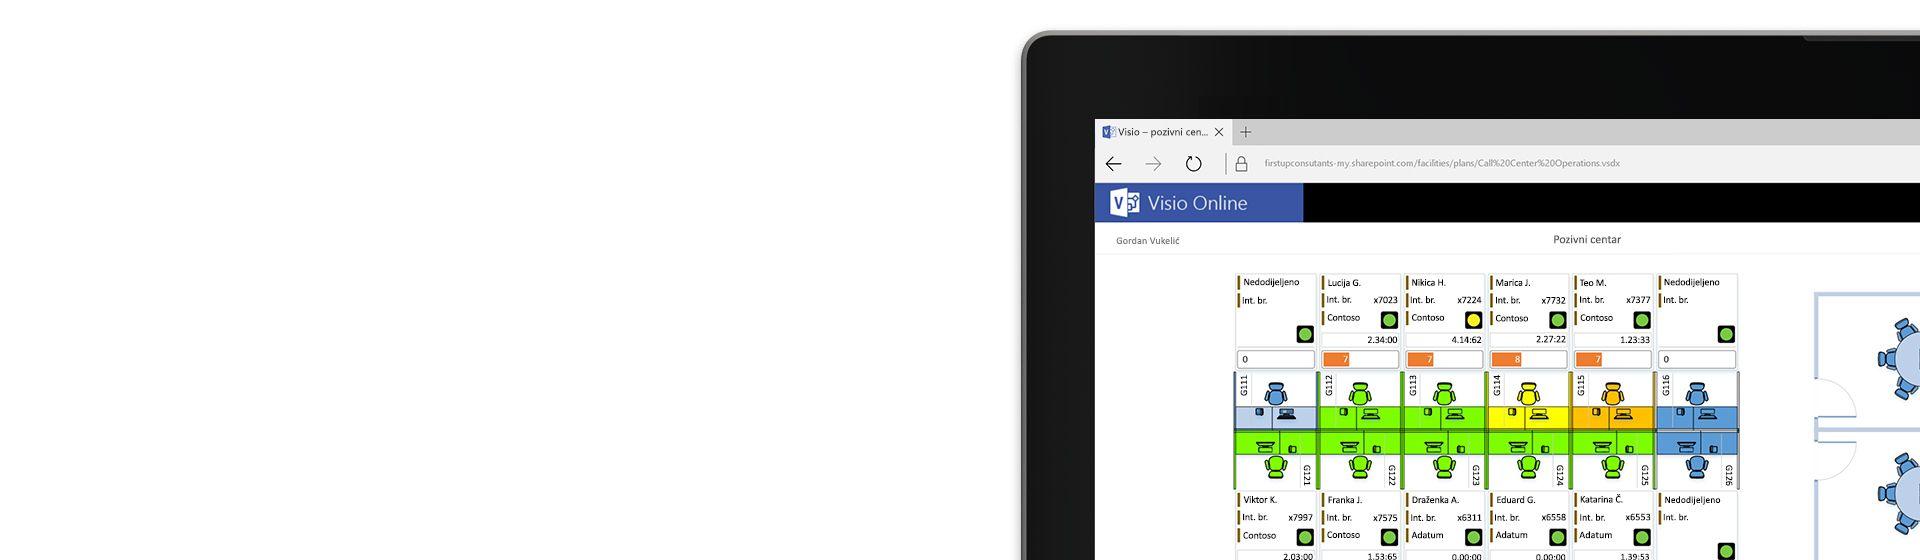 Kut zaslona tableta na kojem je prikazan dijagram tlocrta pozivnog centra u programu Visio